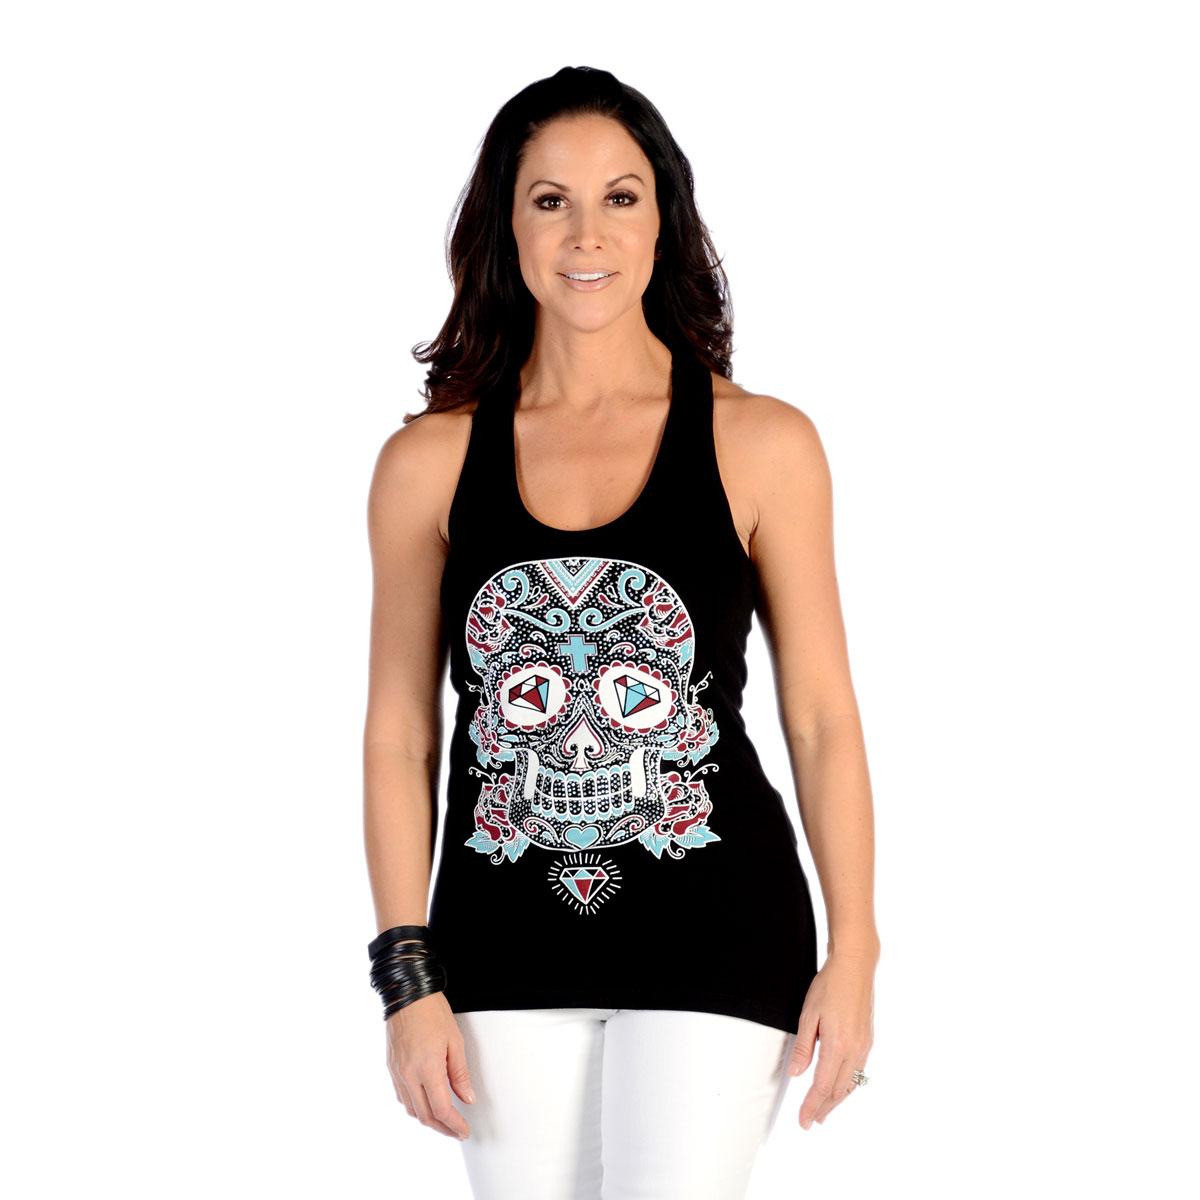 Liberty Wear Women's Diamond Eyed Calavera Black Tank Top